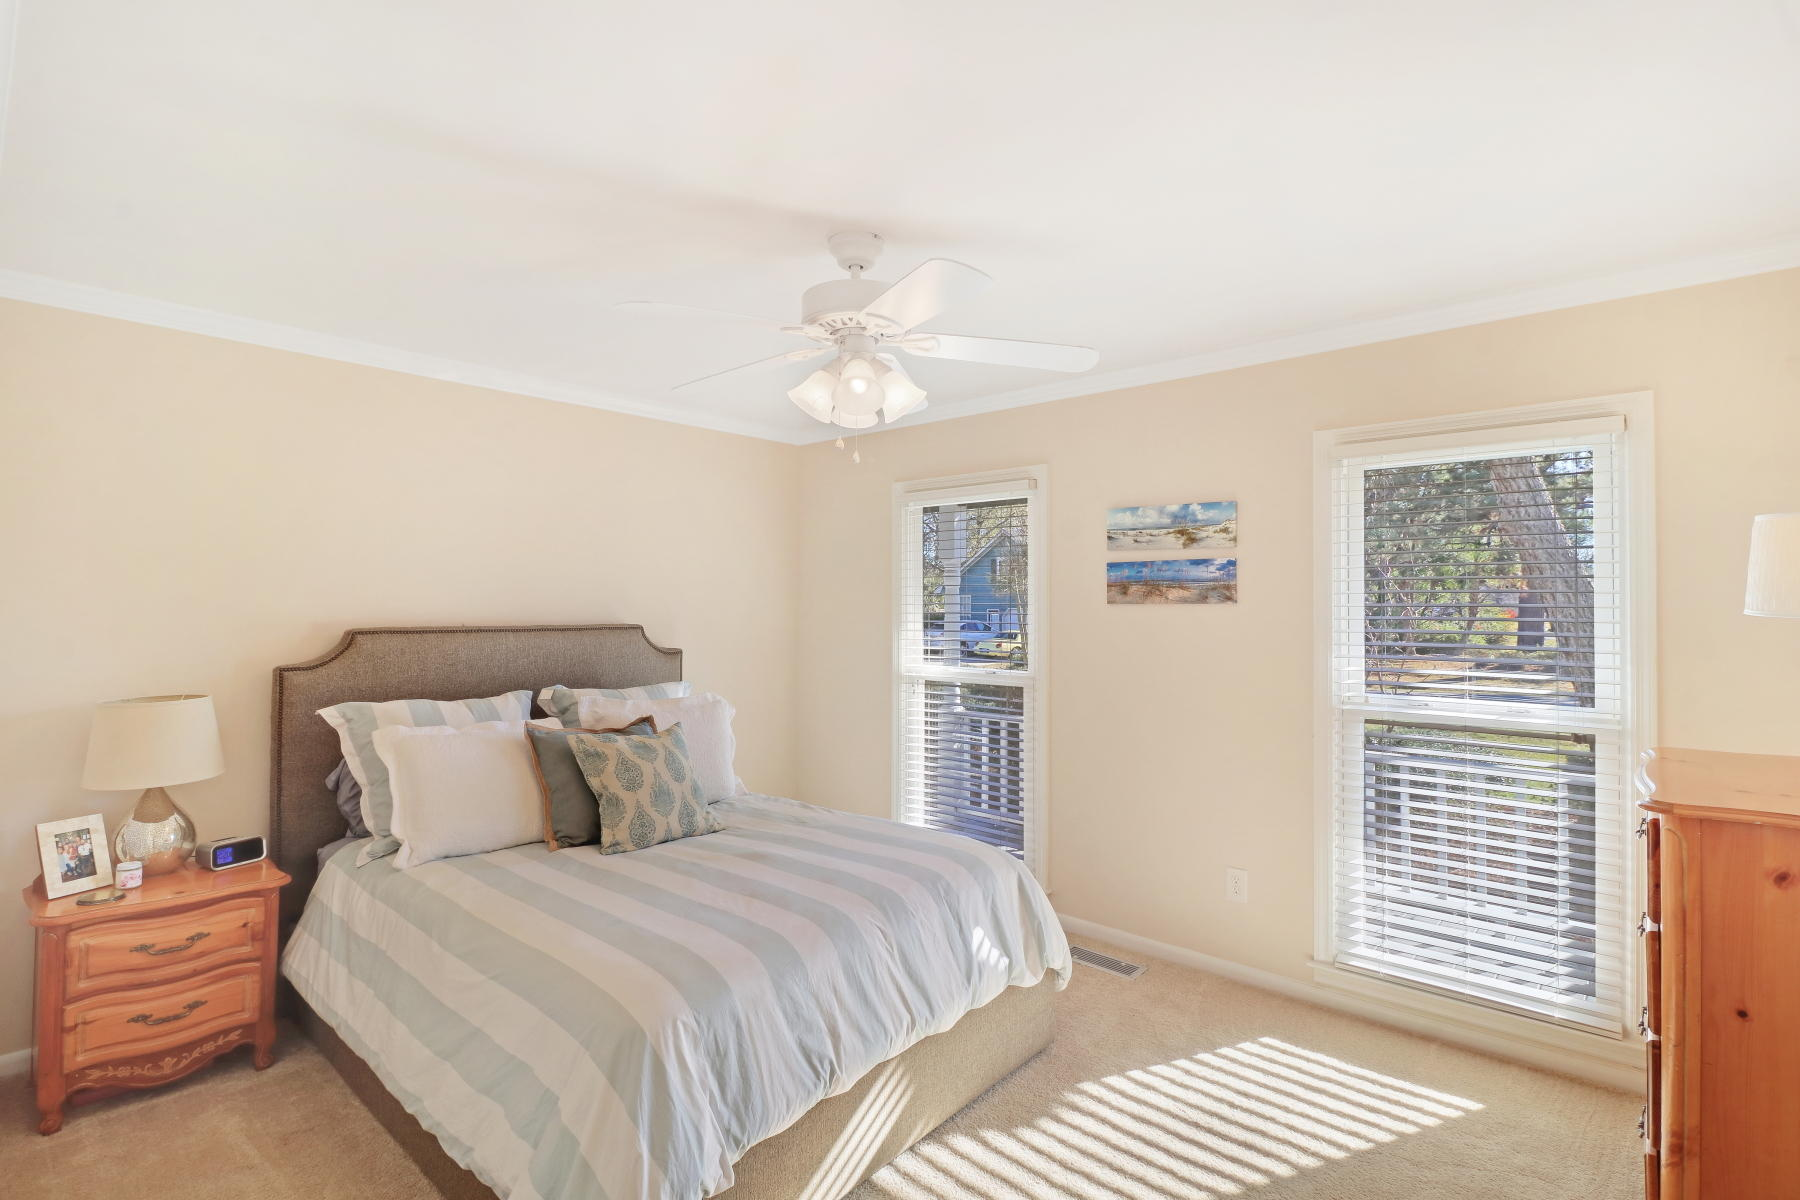 Harrison Acres Homes For Sale - 51 Markfield, Charleston, SC - 16